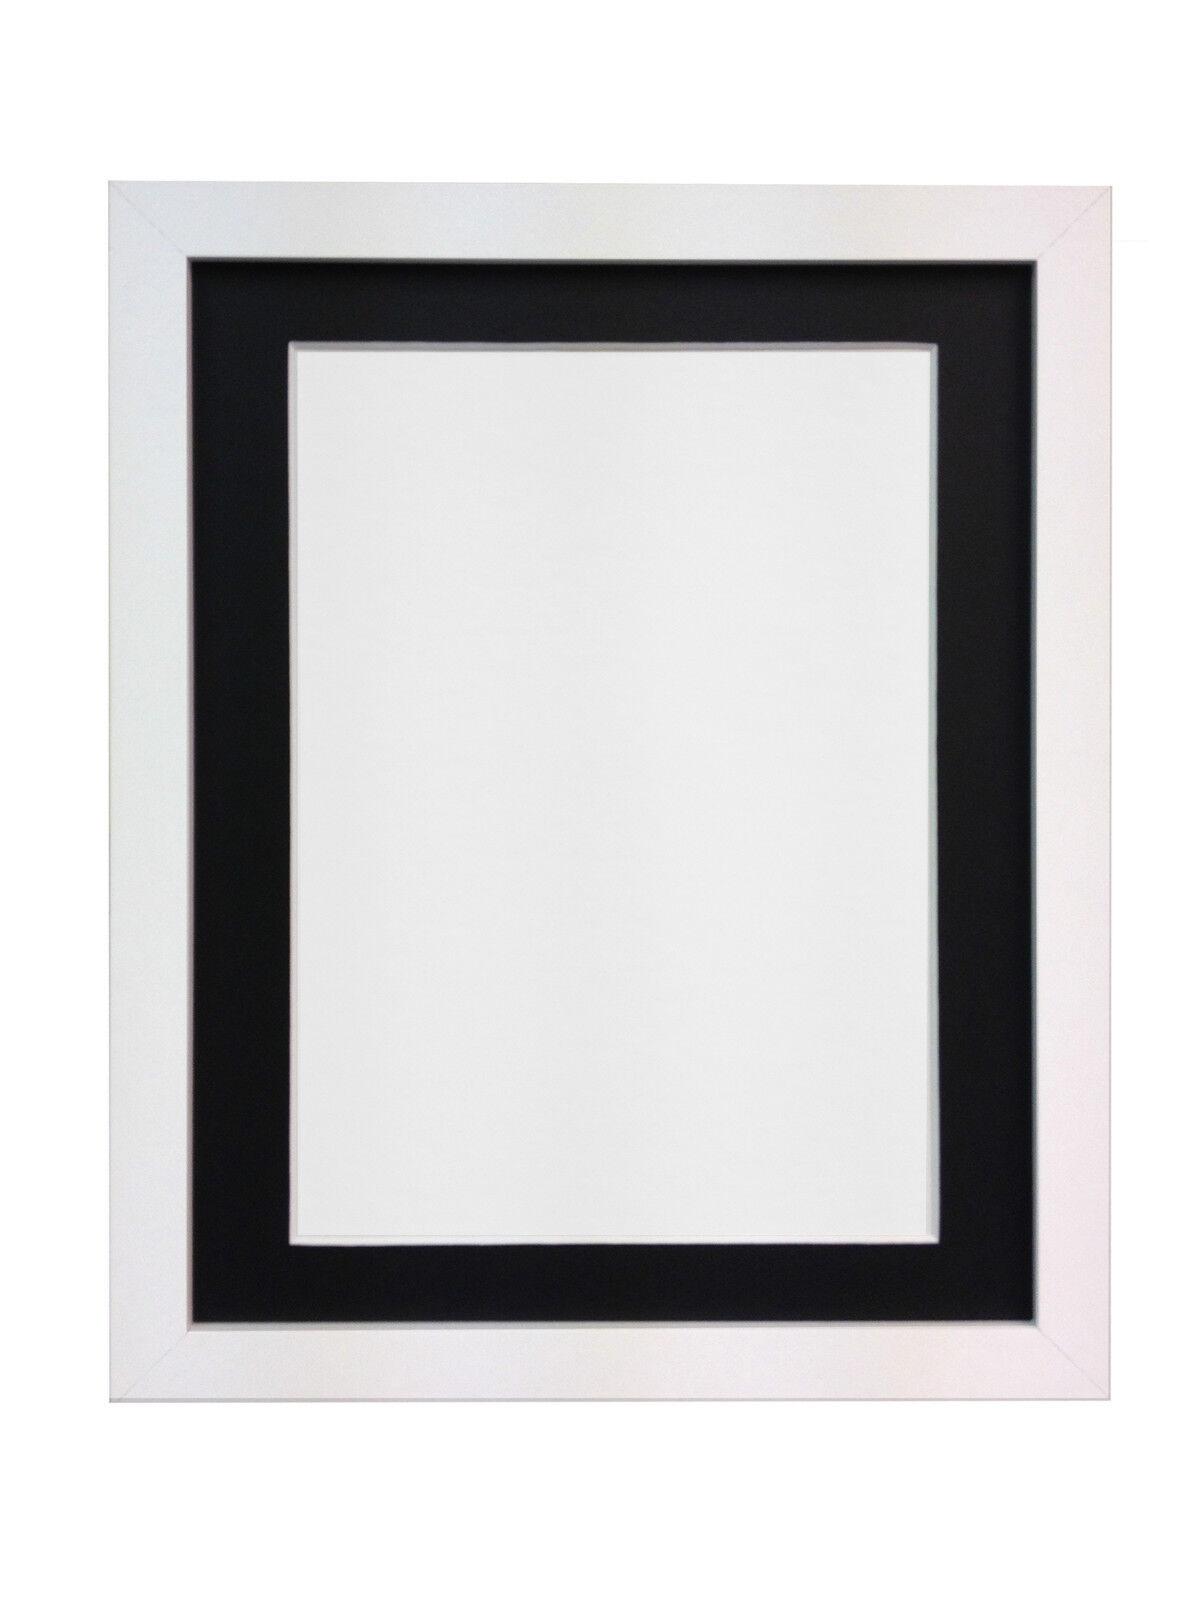 white black large photo picture frames with white ivory or black mounts h7 mdf ebay. Black Bedroom Furniture Sets. Home Design Ideas